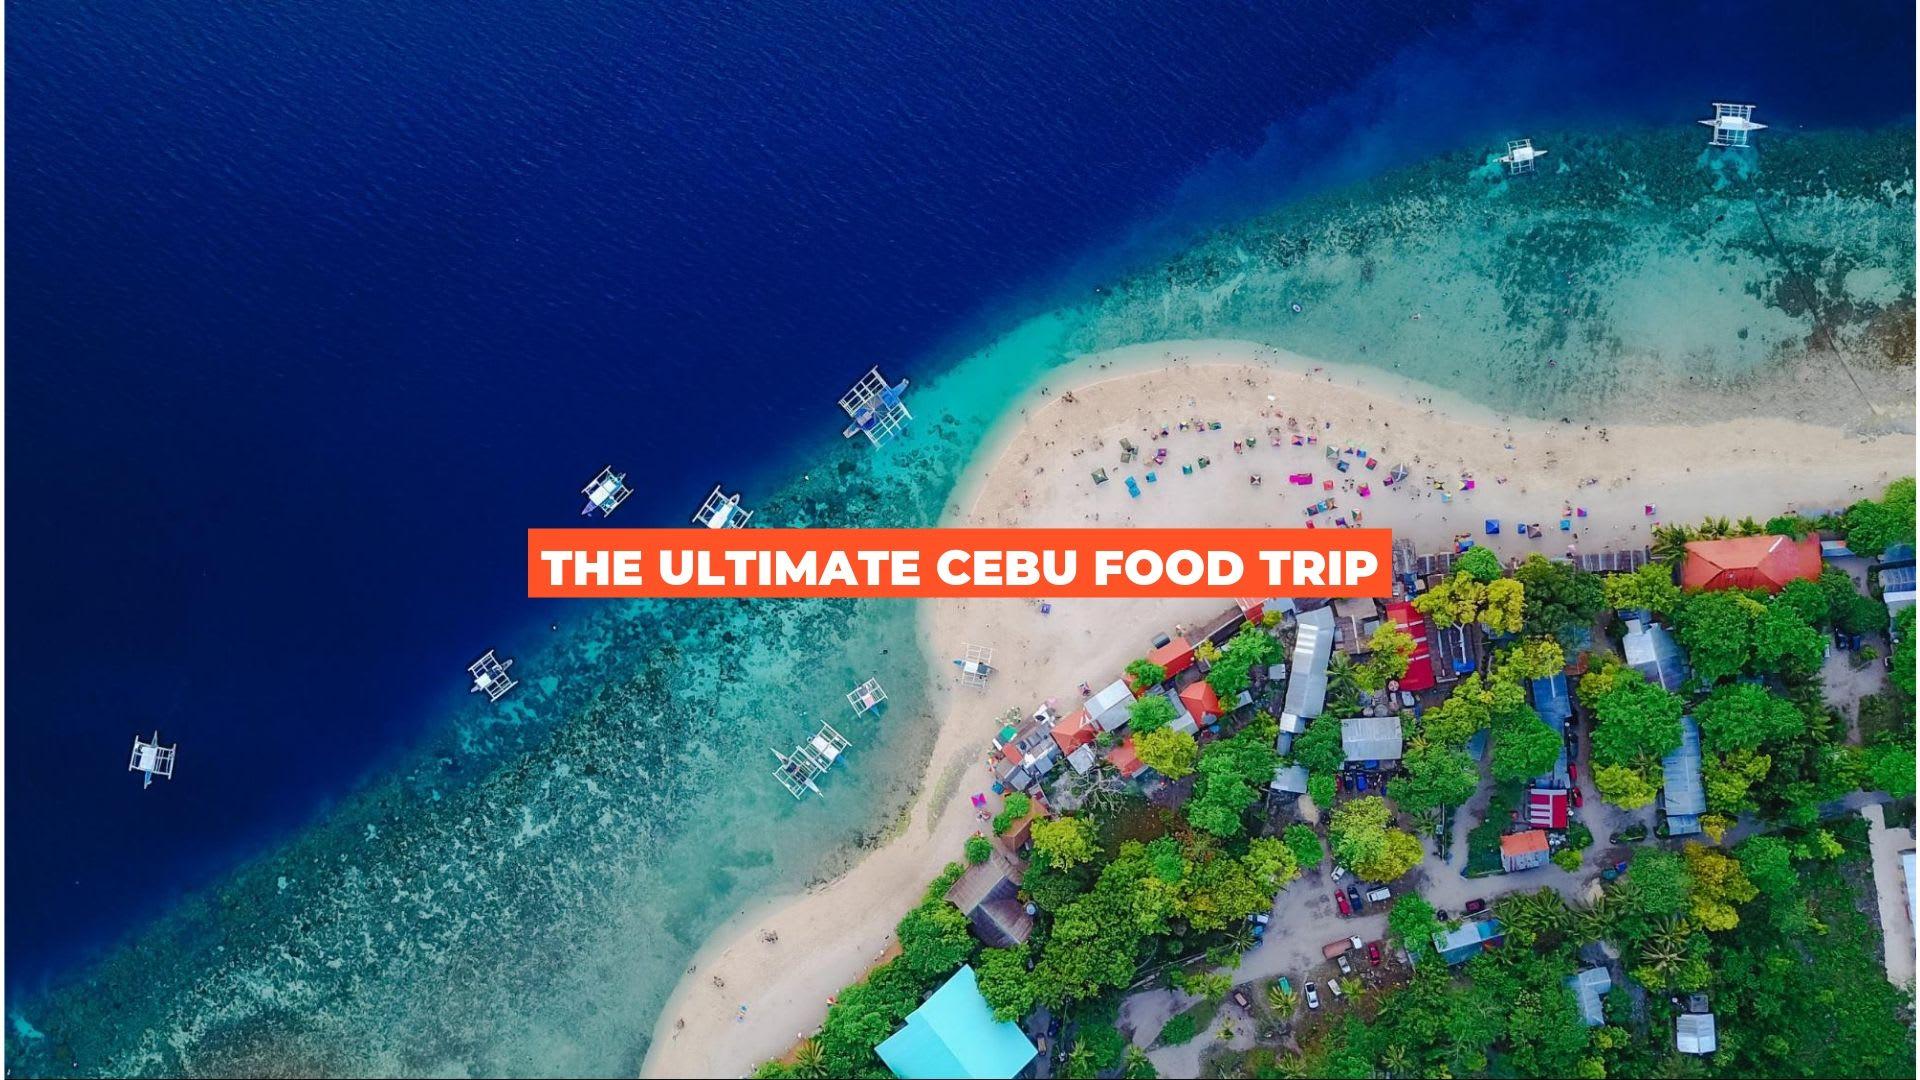 FOOD TRIP CEBU COVER